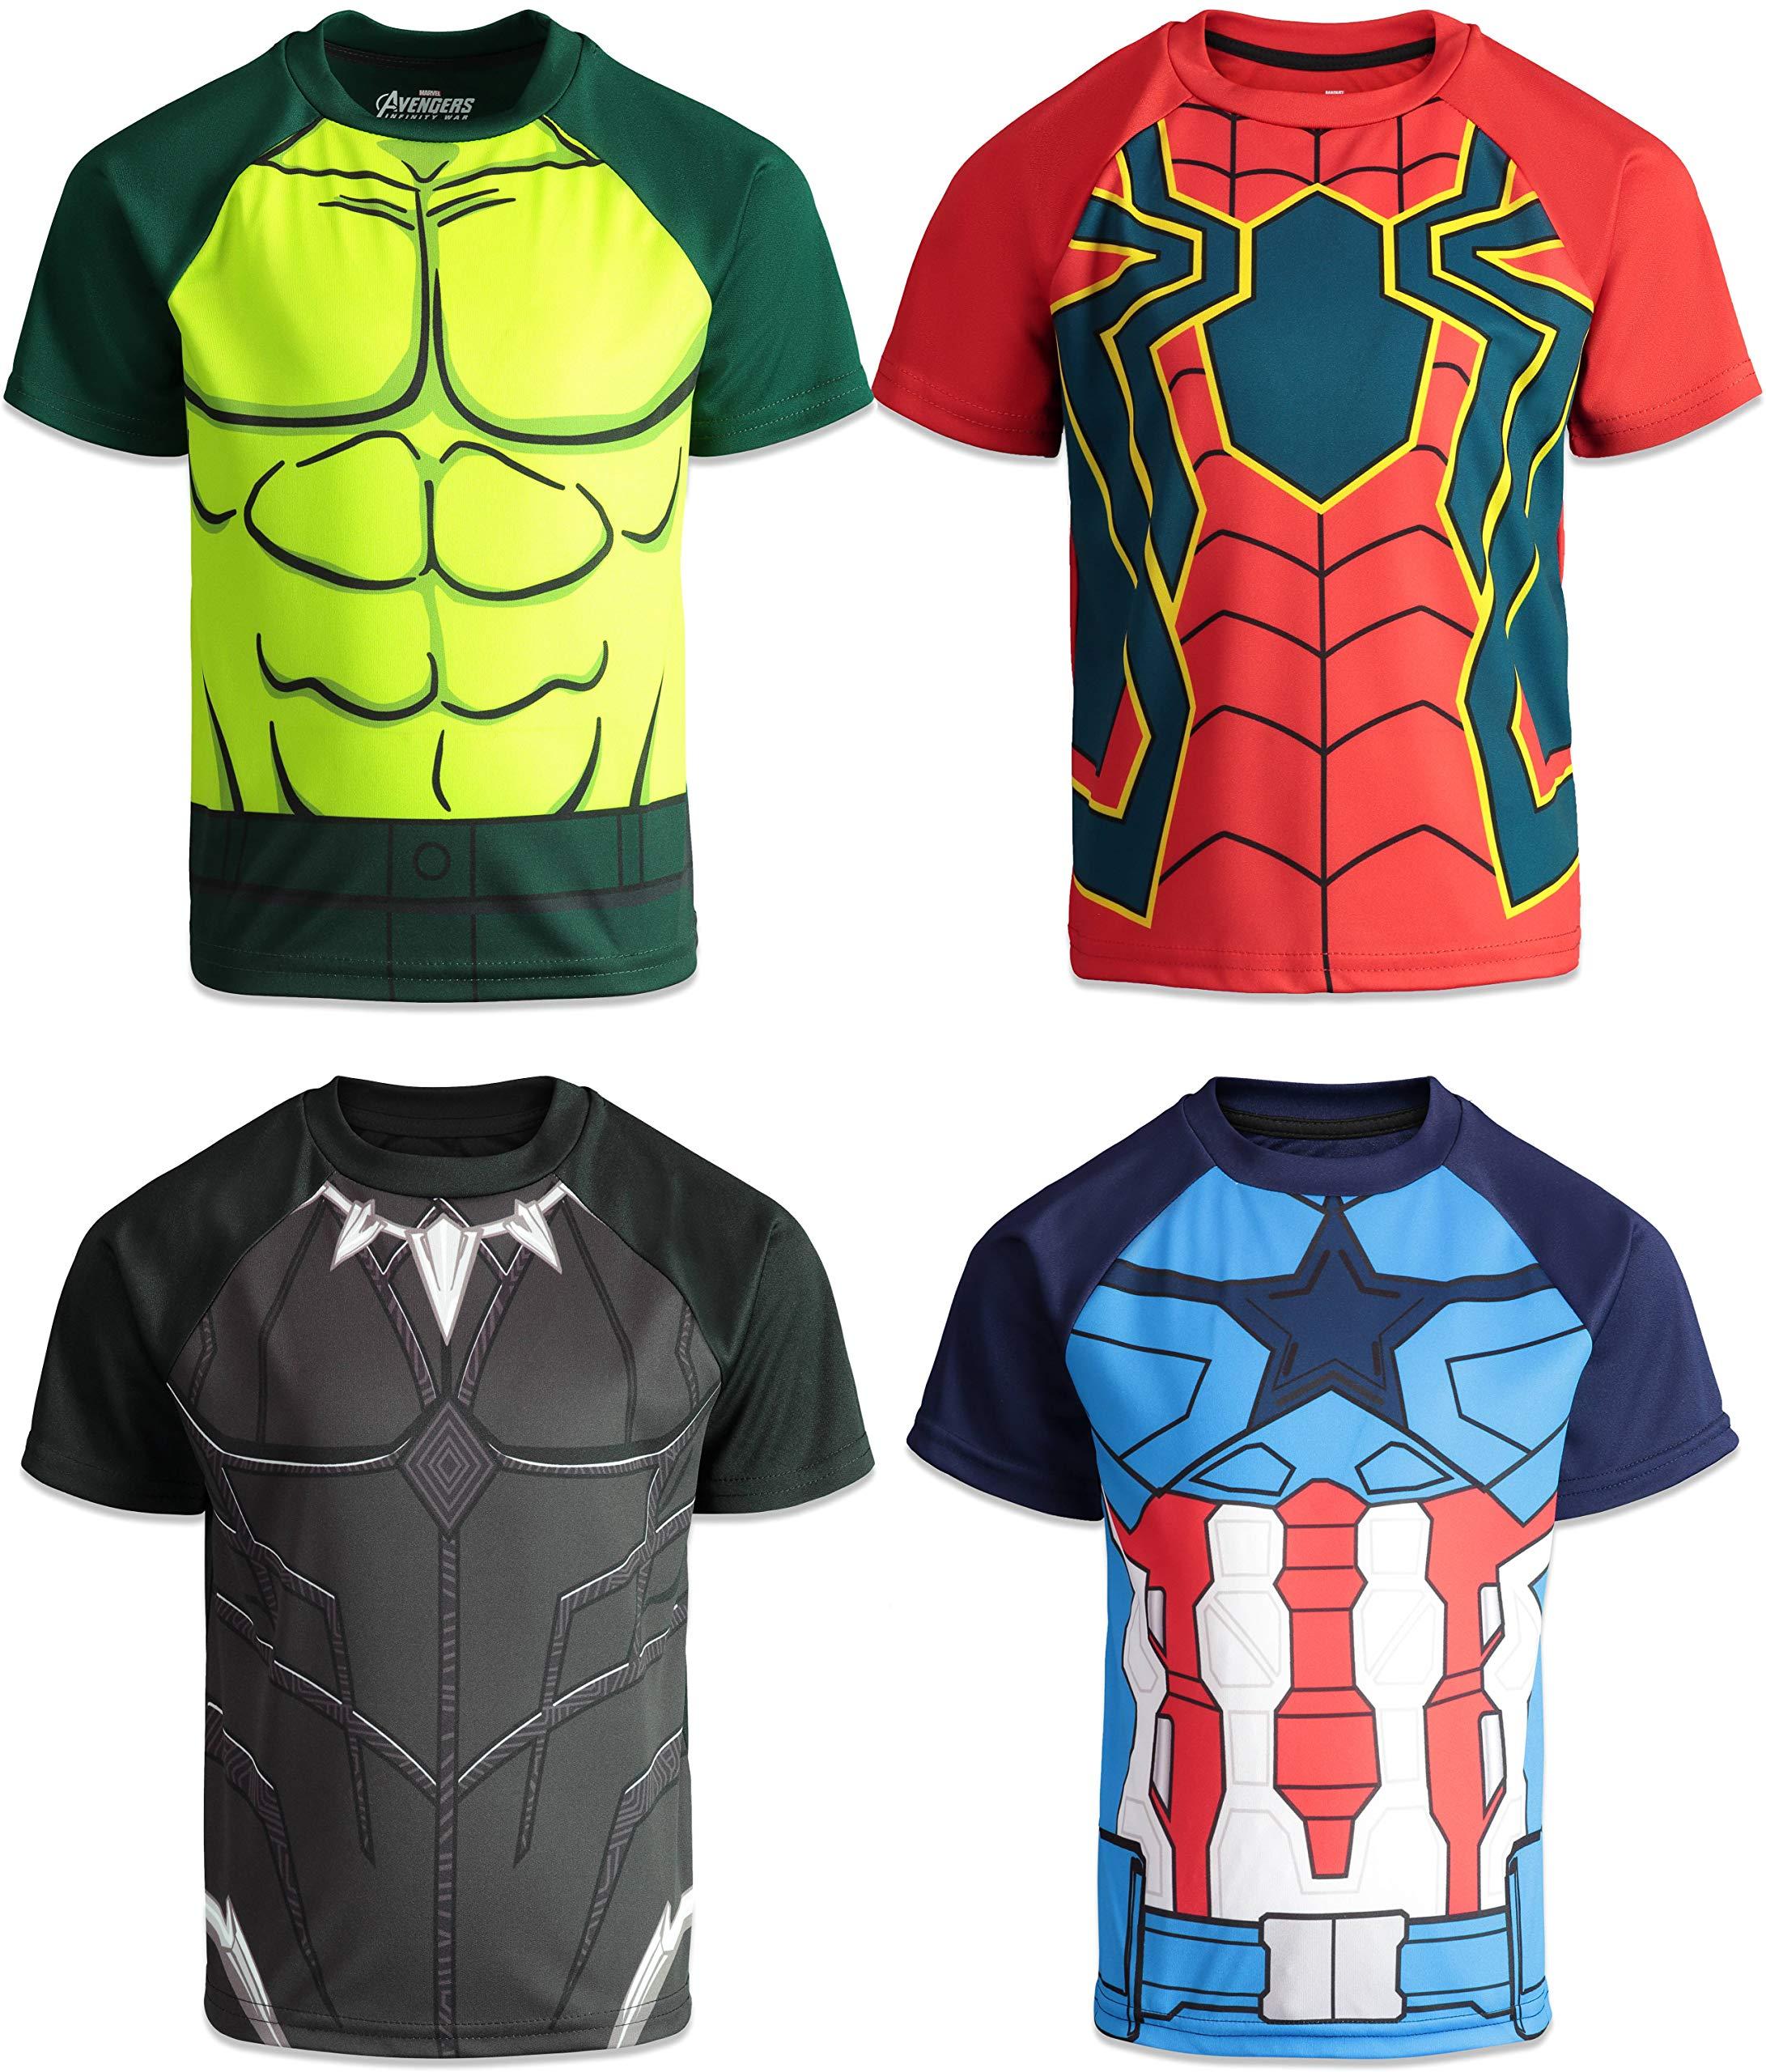 Marvel Avengers Boys 4 Pack T-Shirts Black Panther Hulk Spiderman Captain America 6